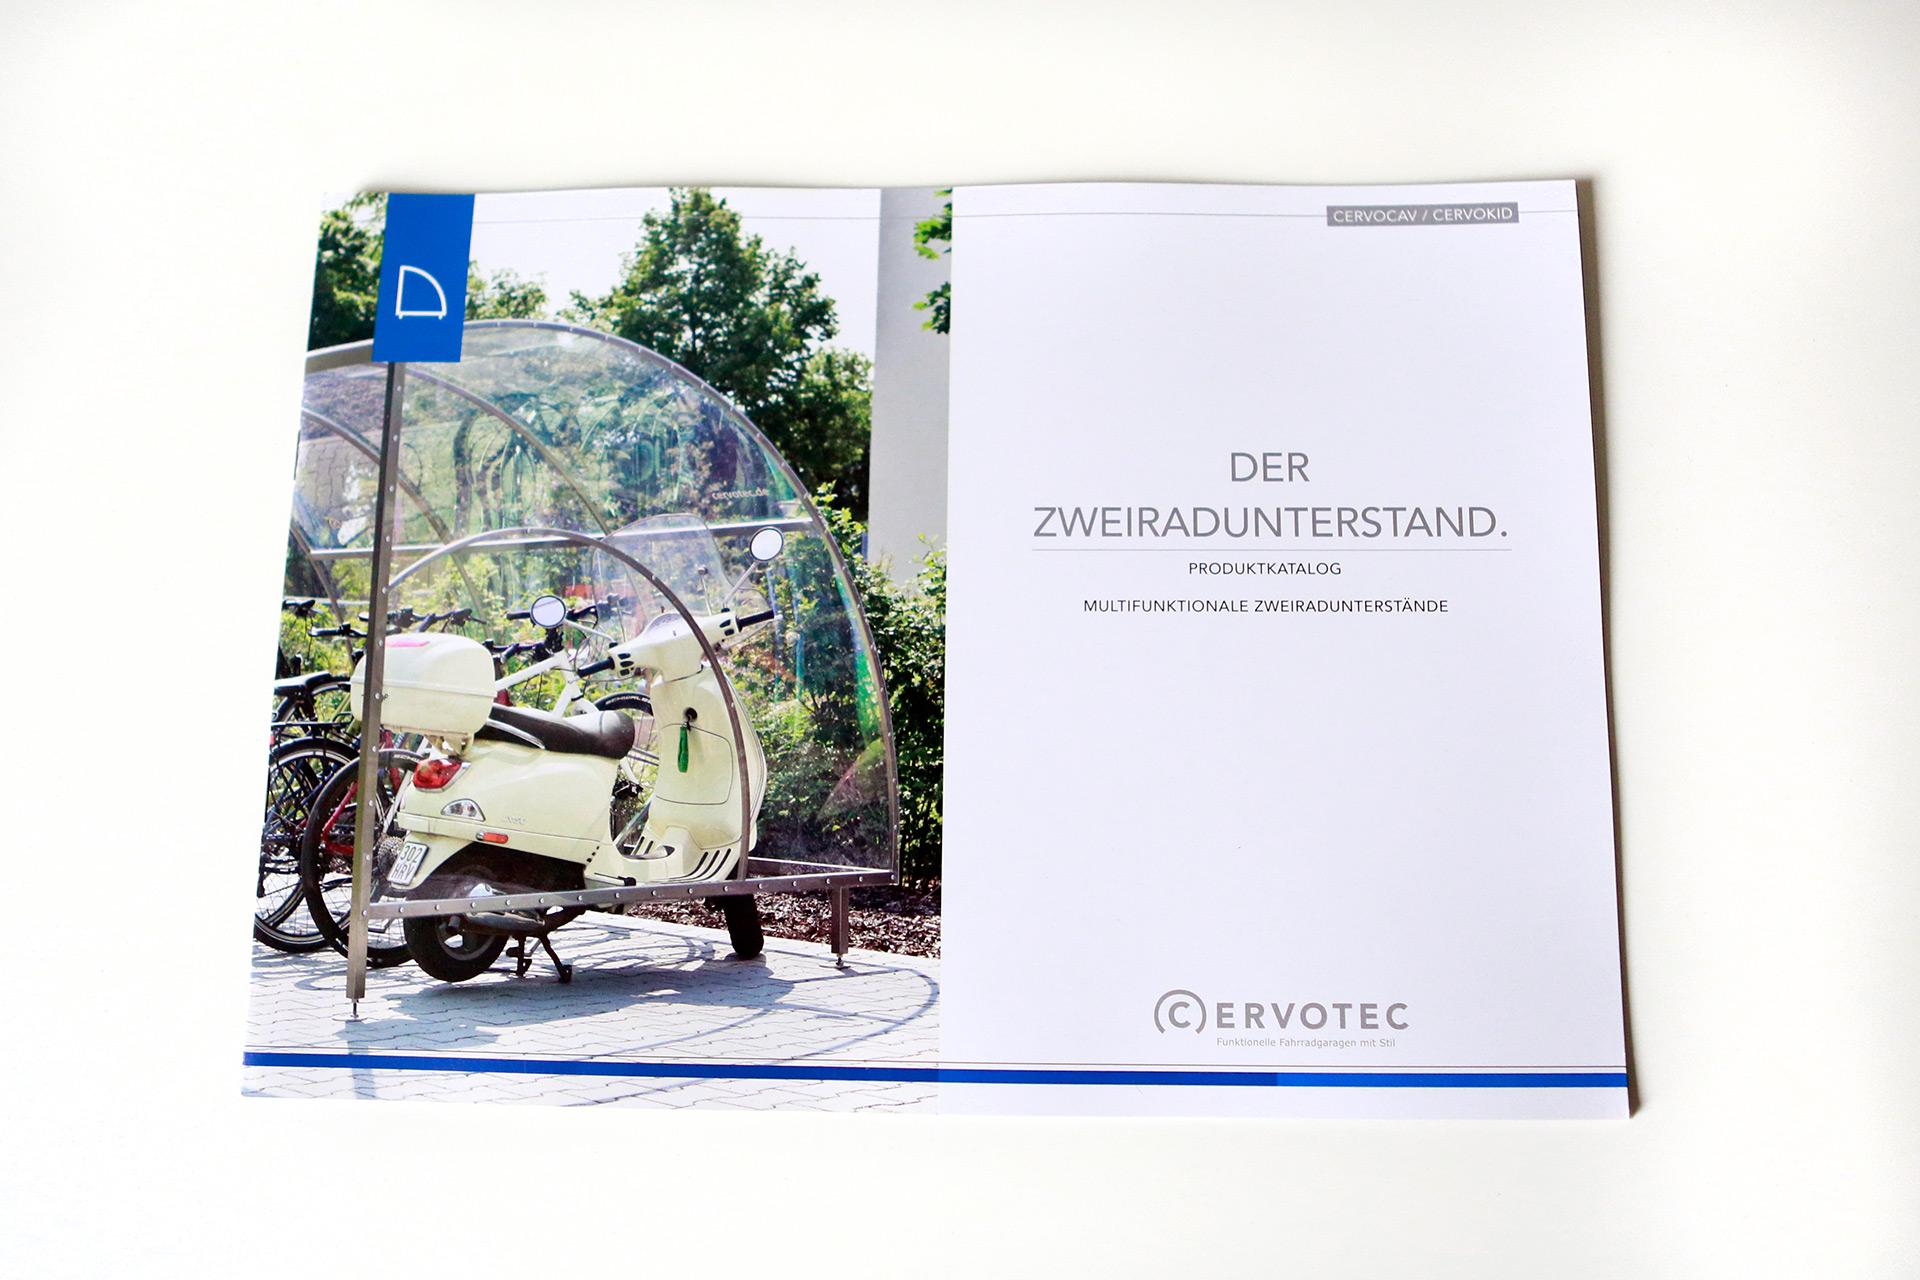 Cervotec, Corporate Design, Broschüre, Layout, Katalog, Design, Fahrradgaragen, Münster, Bennet Grüttner